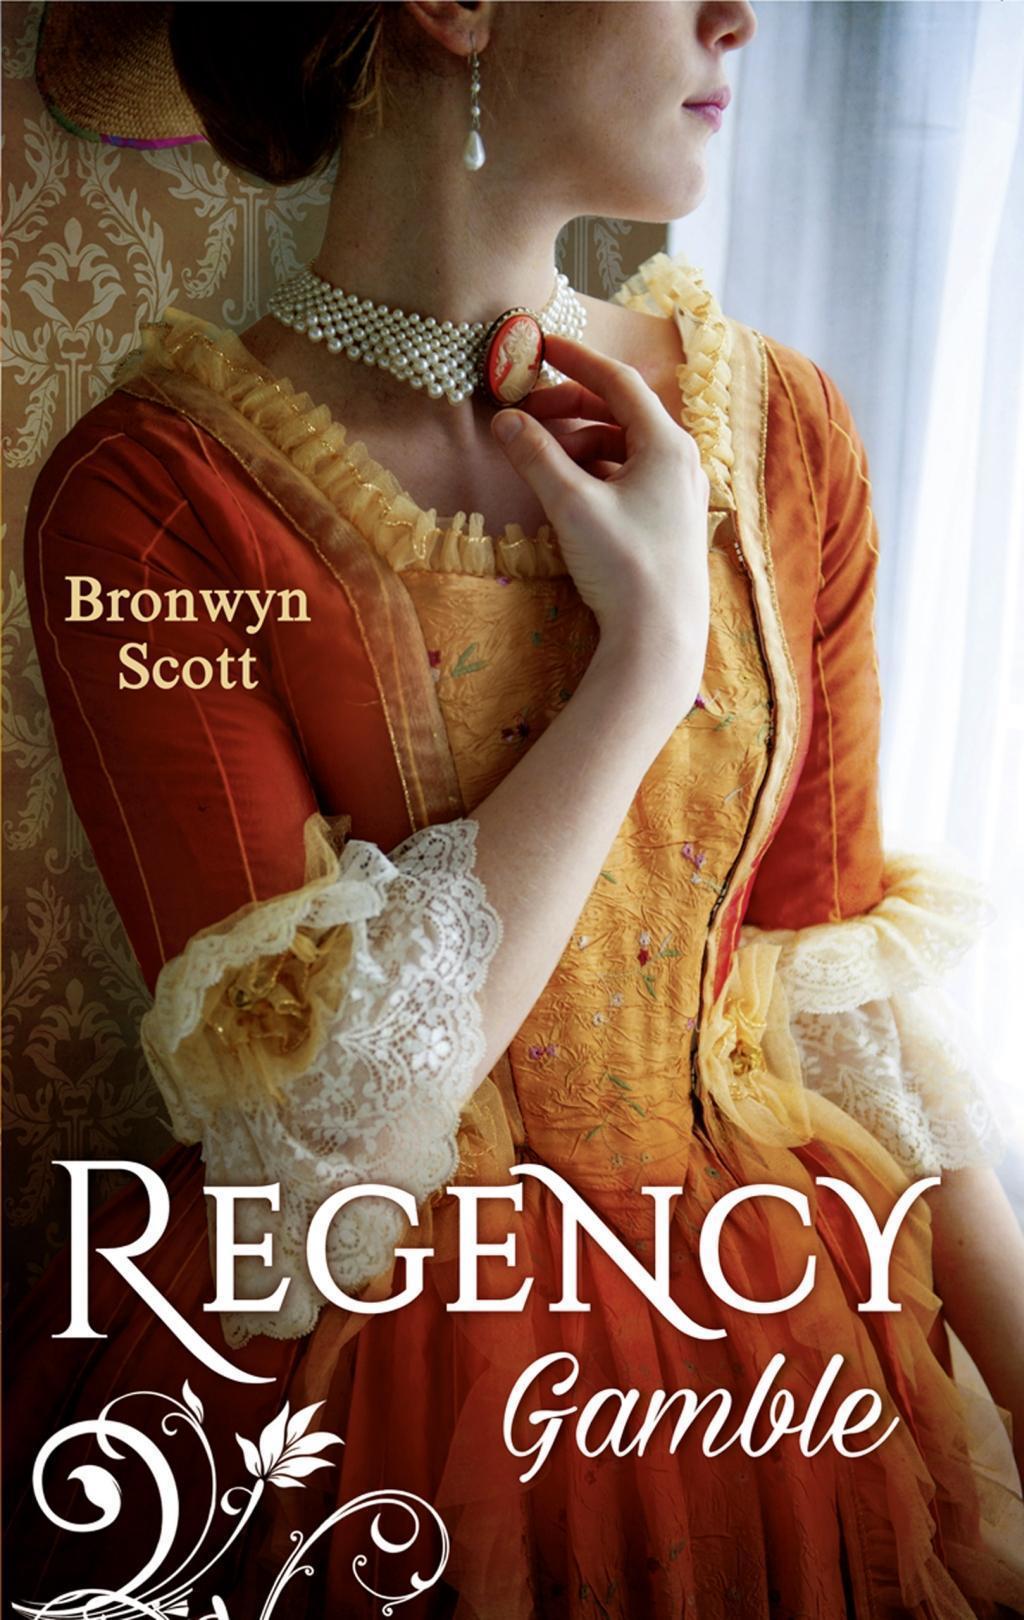 Regency Gamble: A Lady Risks All / A Lady Dares (Mills & Boon M&B)